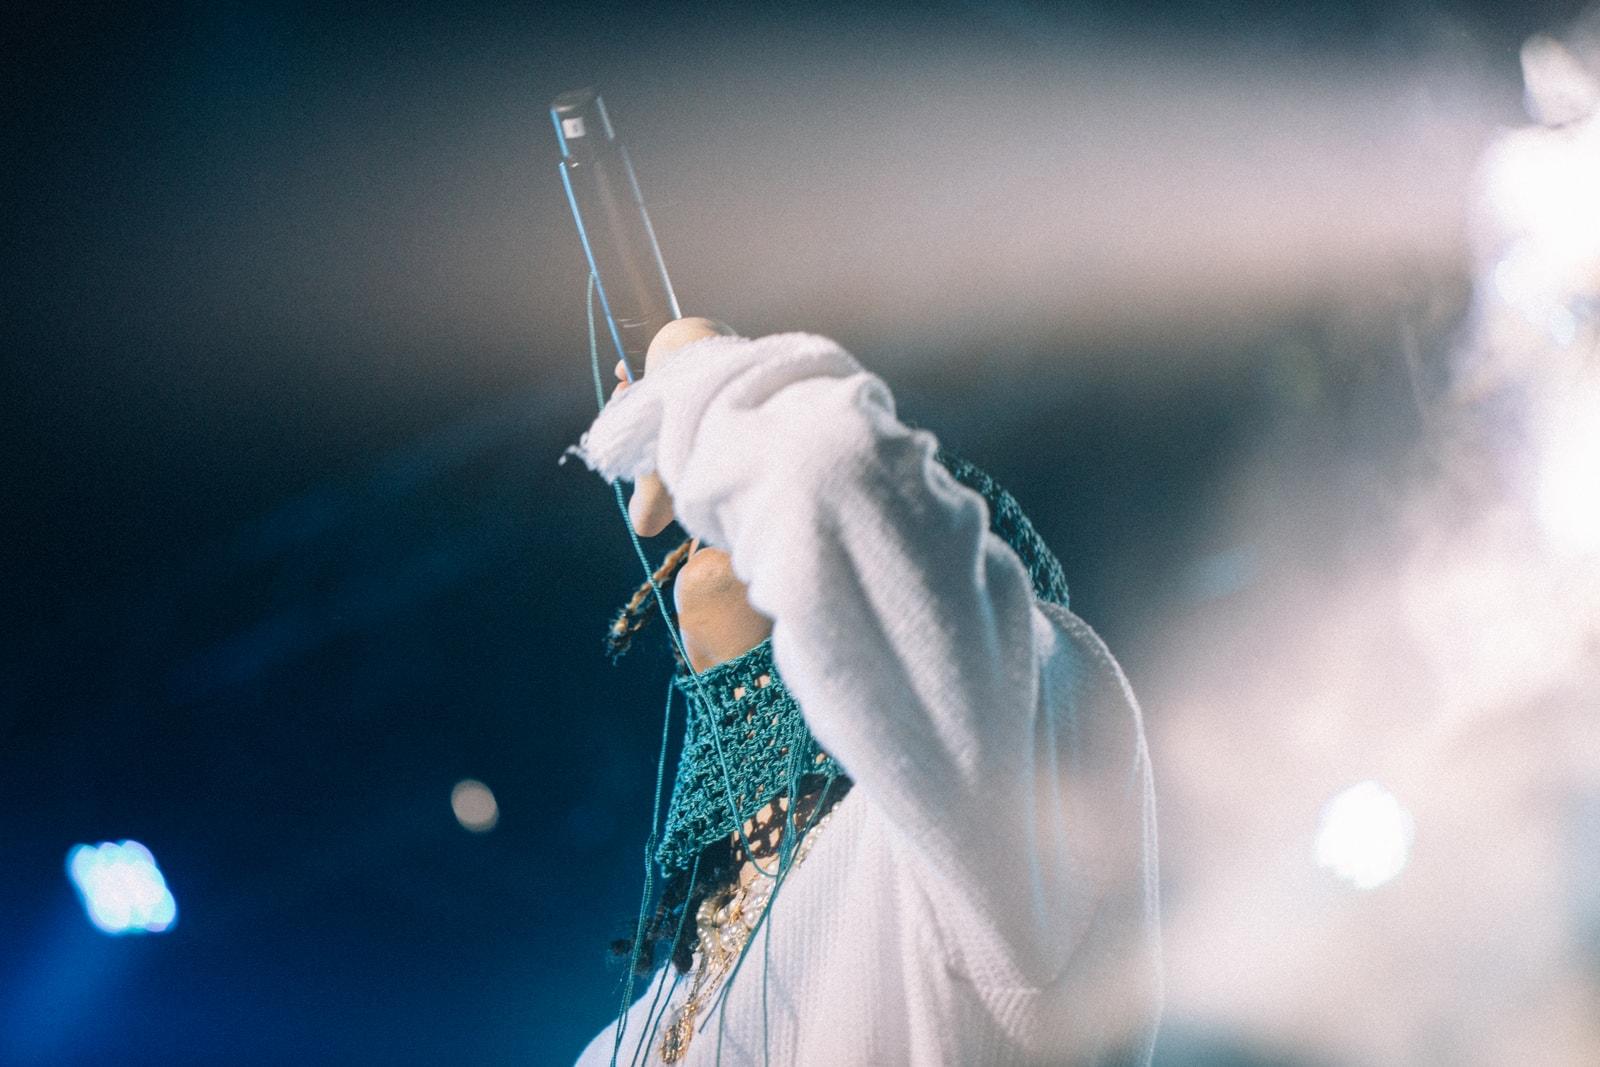 Novel Friday 個人專輯發佈音樂會「在陽光底下」現場回顧